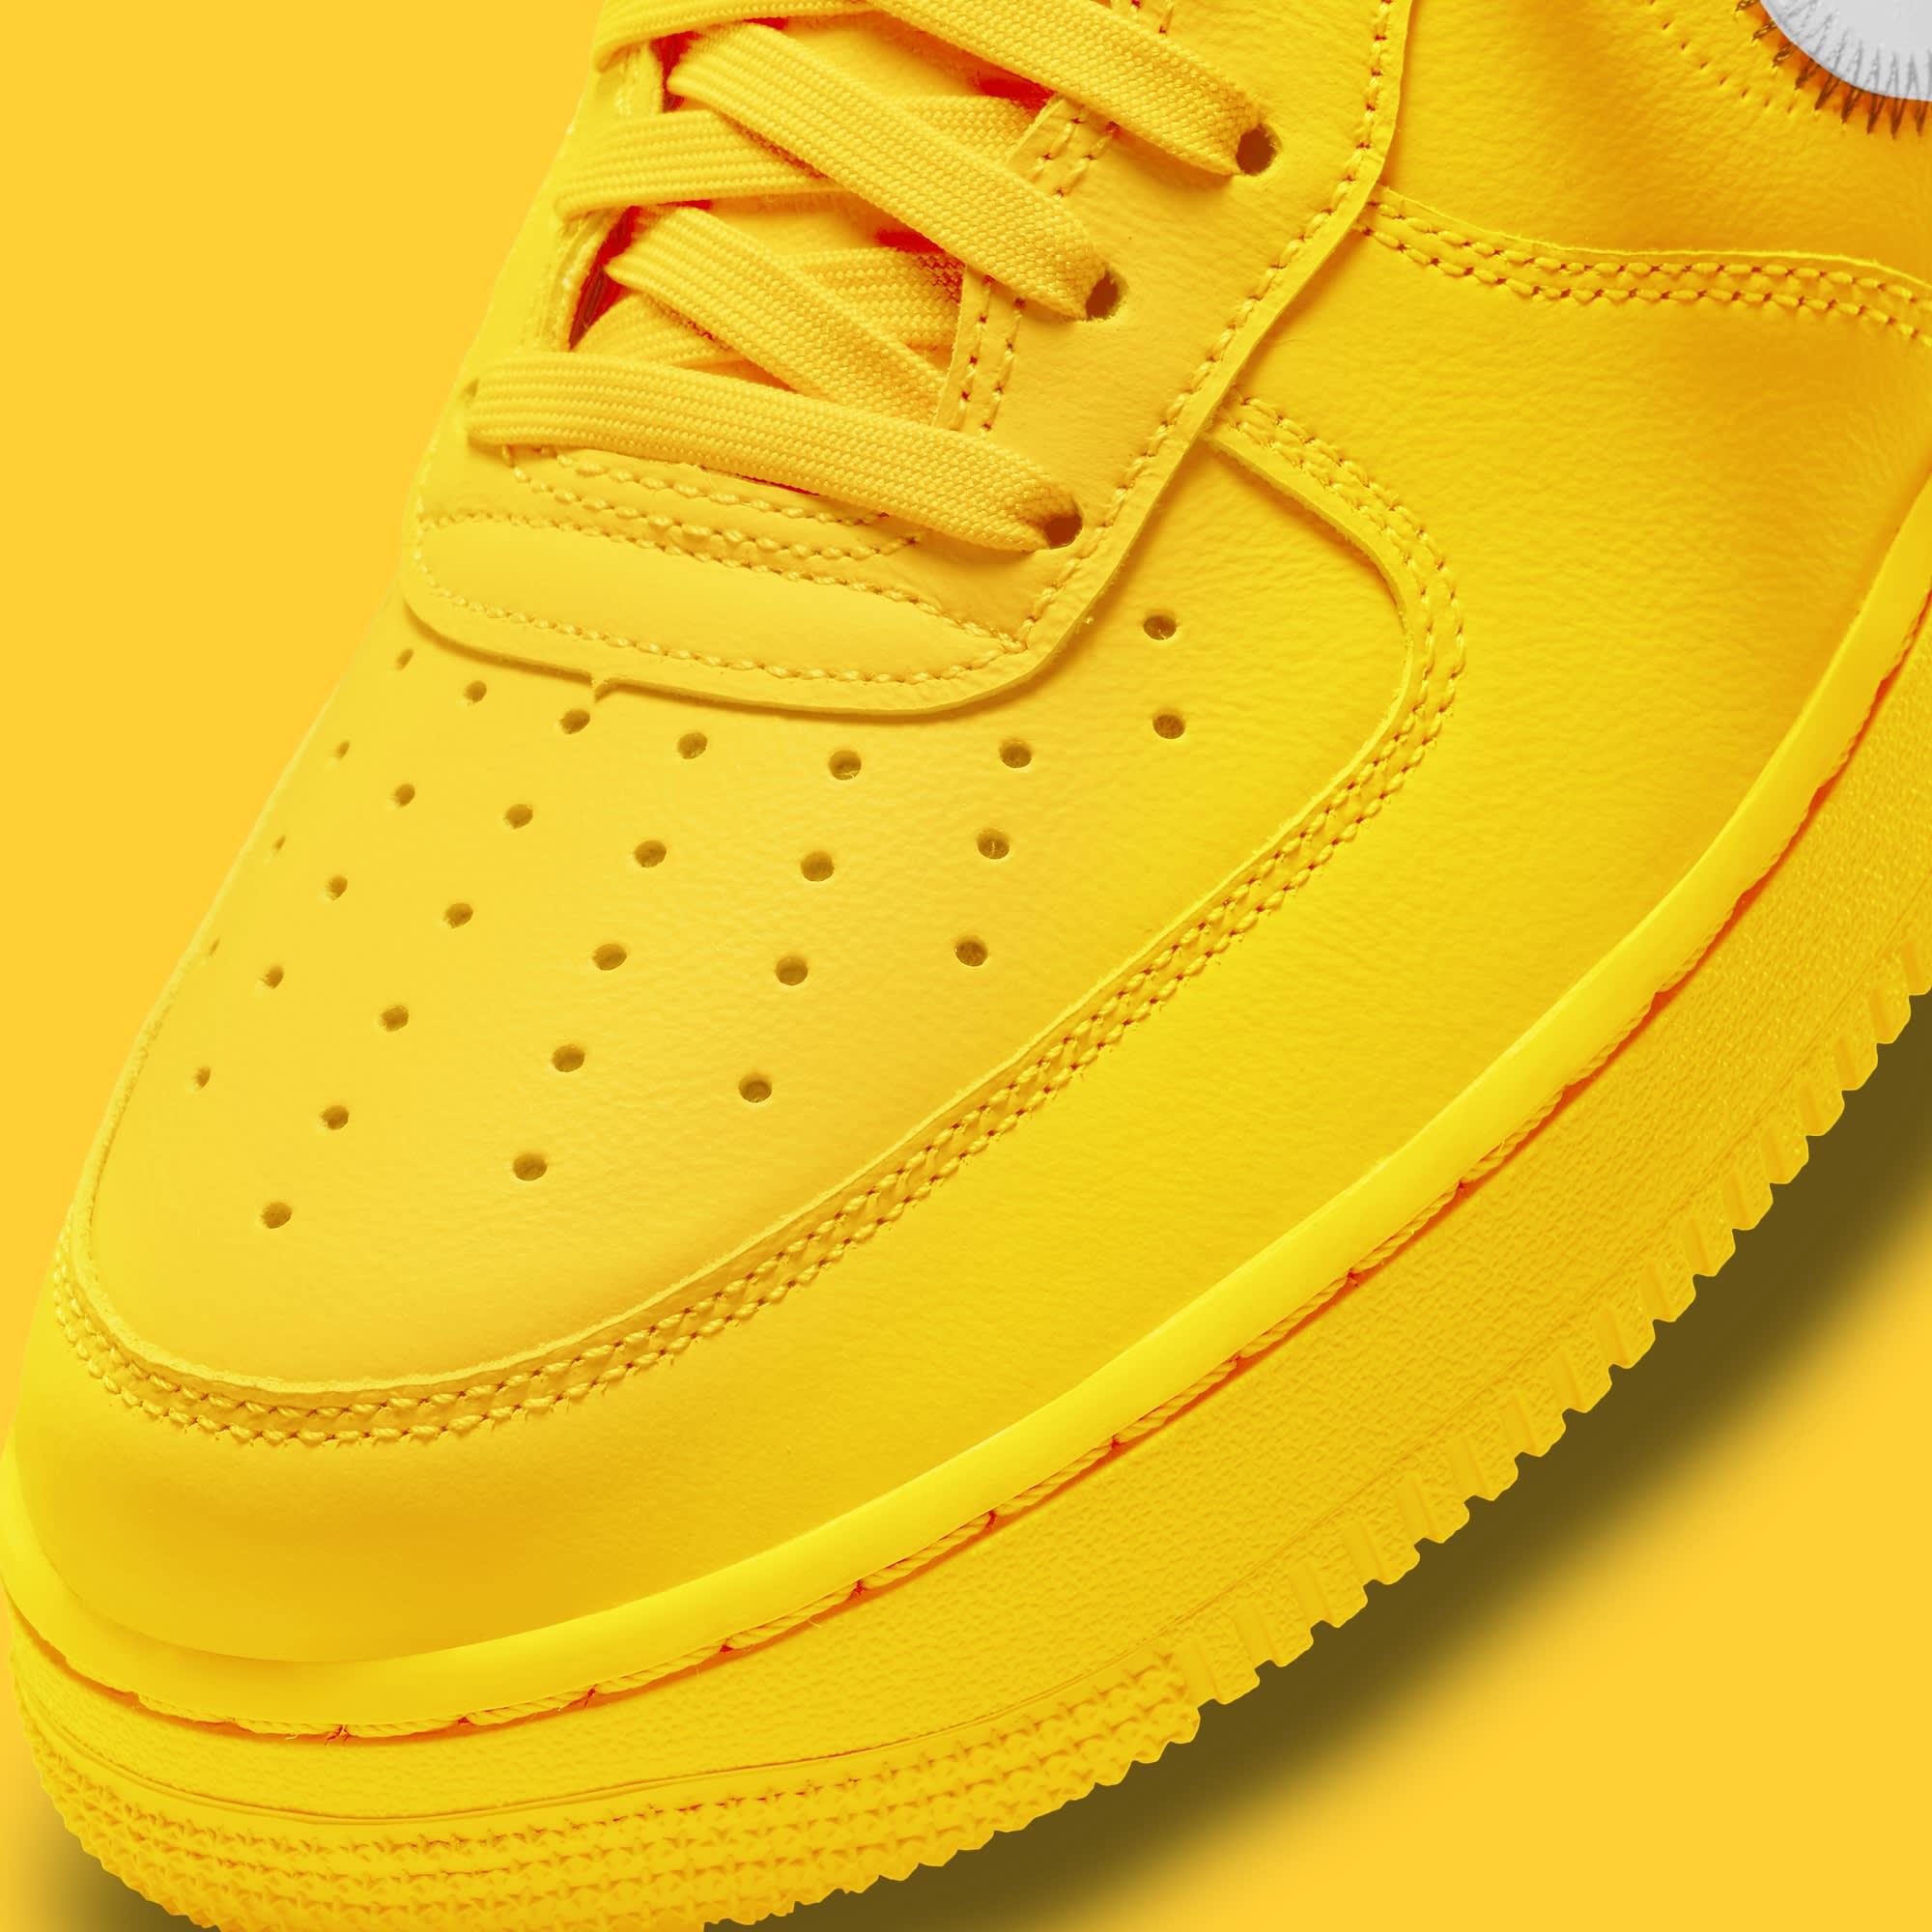 Off-White x Nike Air Force 1 Low 'Lemonade' DD1876-700 Toe